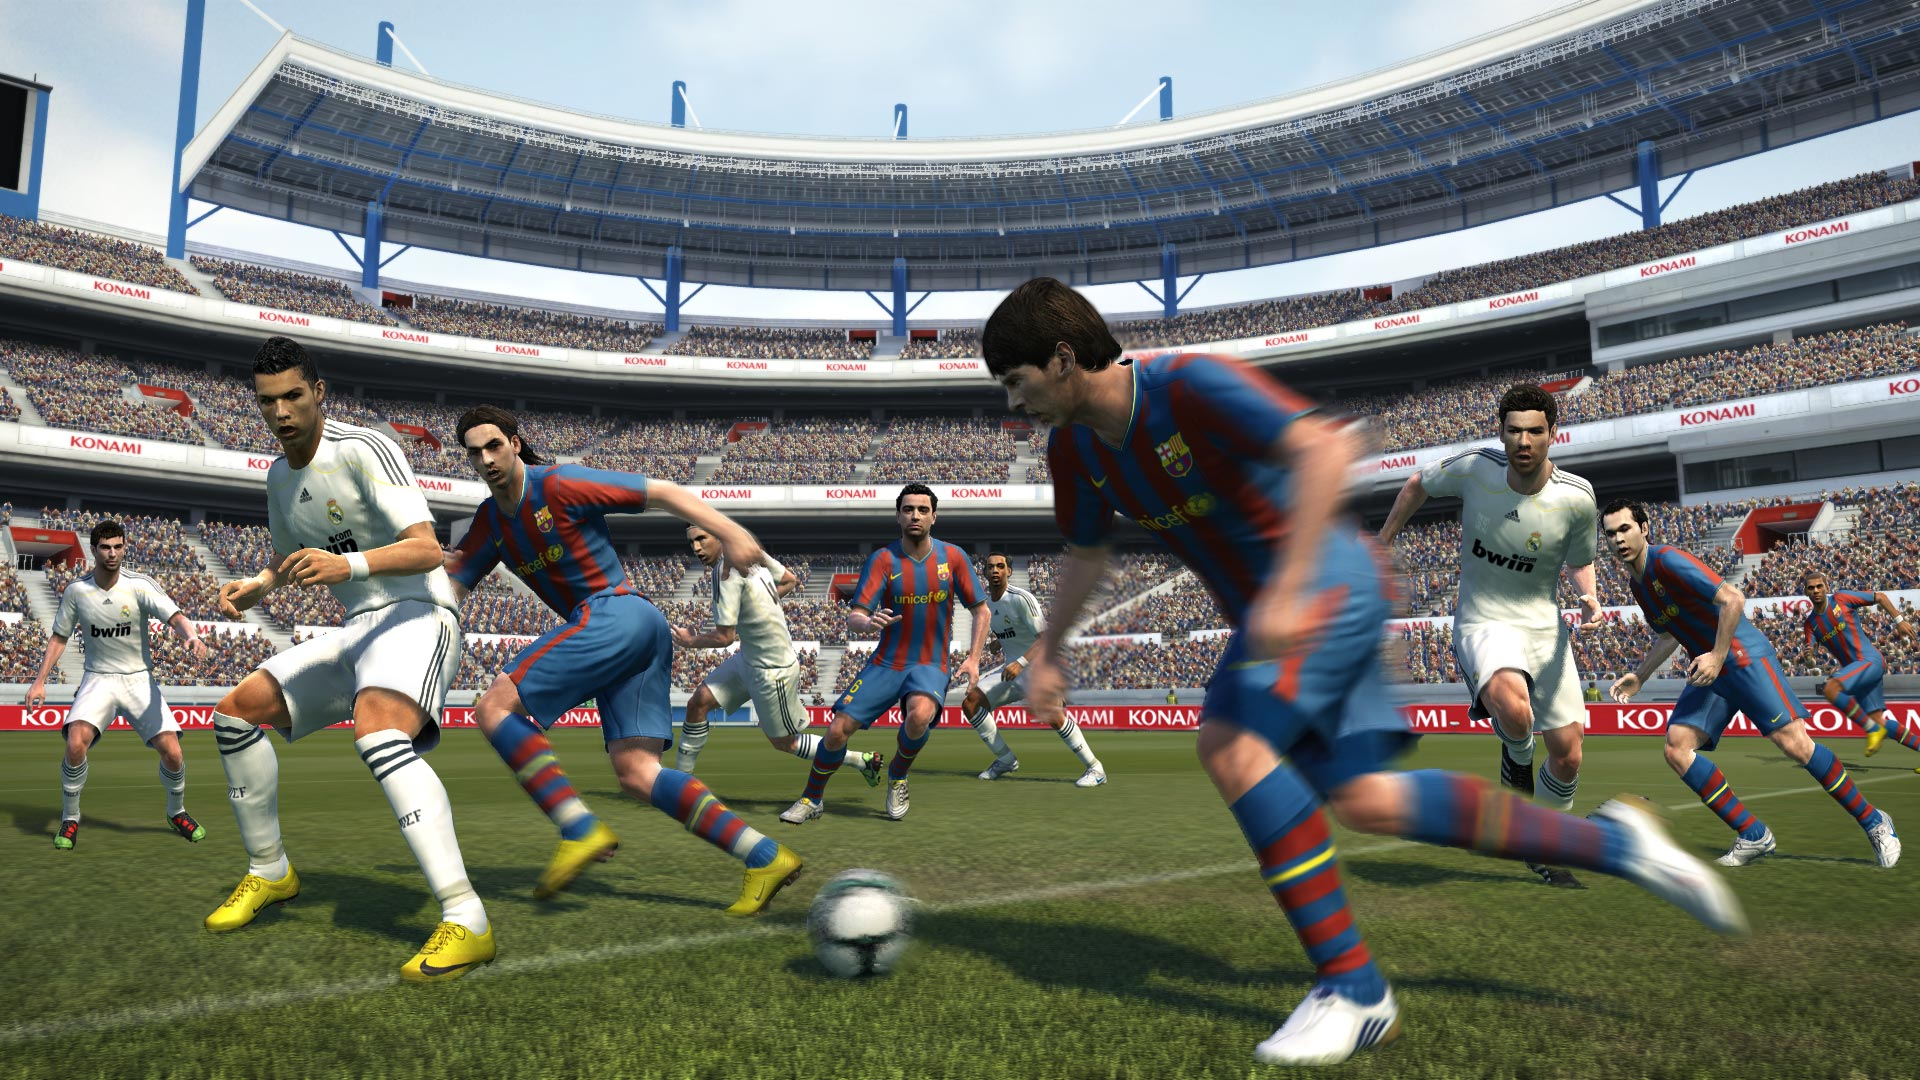 Primeras fotos ingame de Pro Evolution Soccer 2011 se ven bastante bien [Screens]